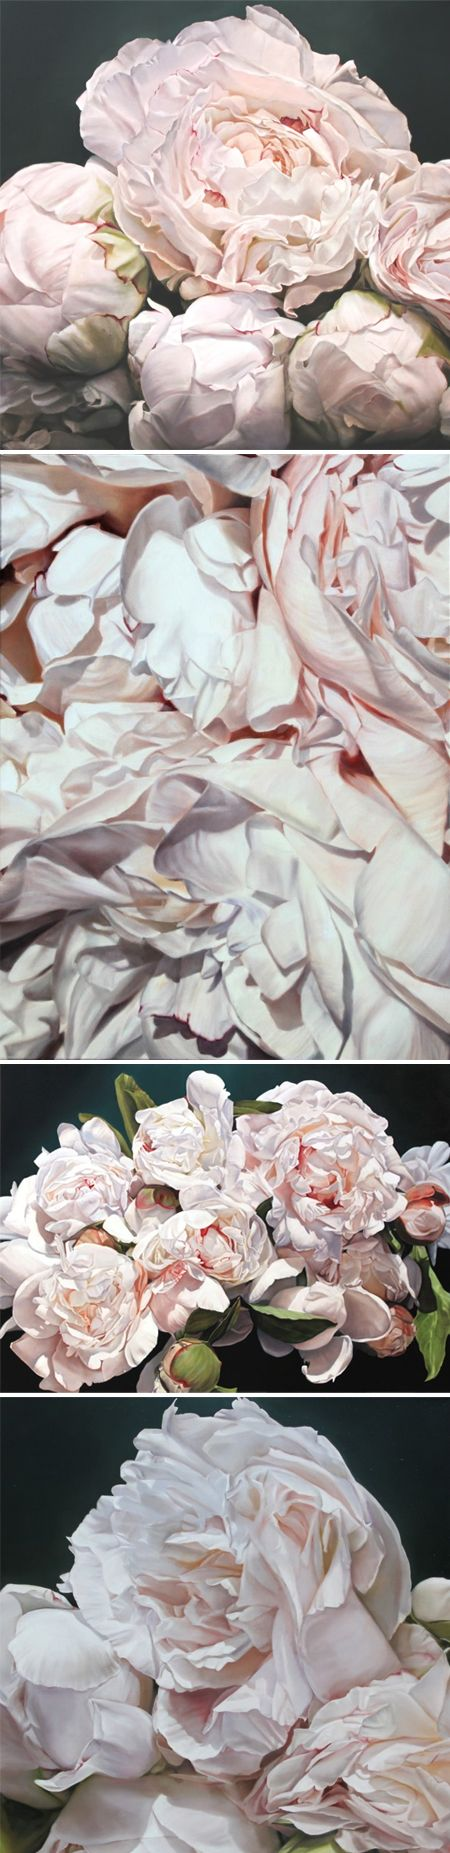 "Thomas Darnell: ""Peony"", Oil on canvas."